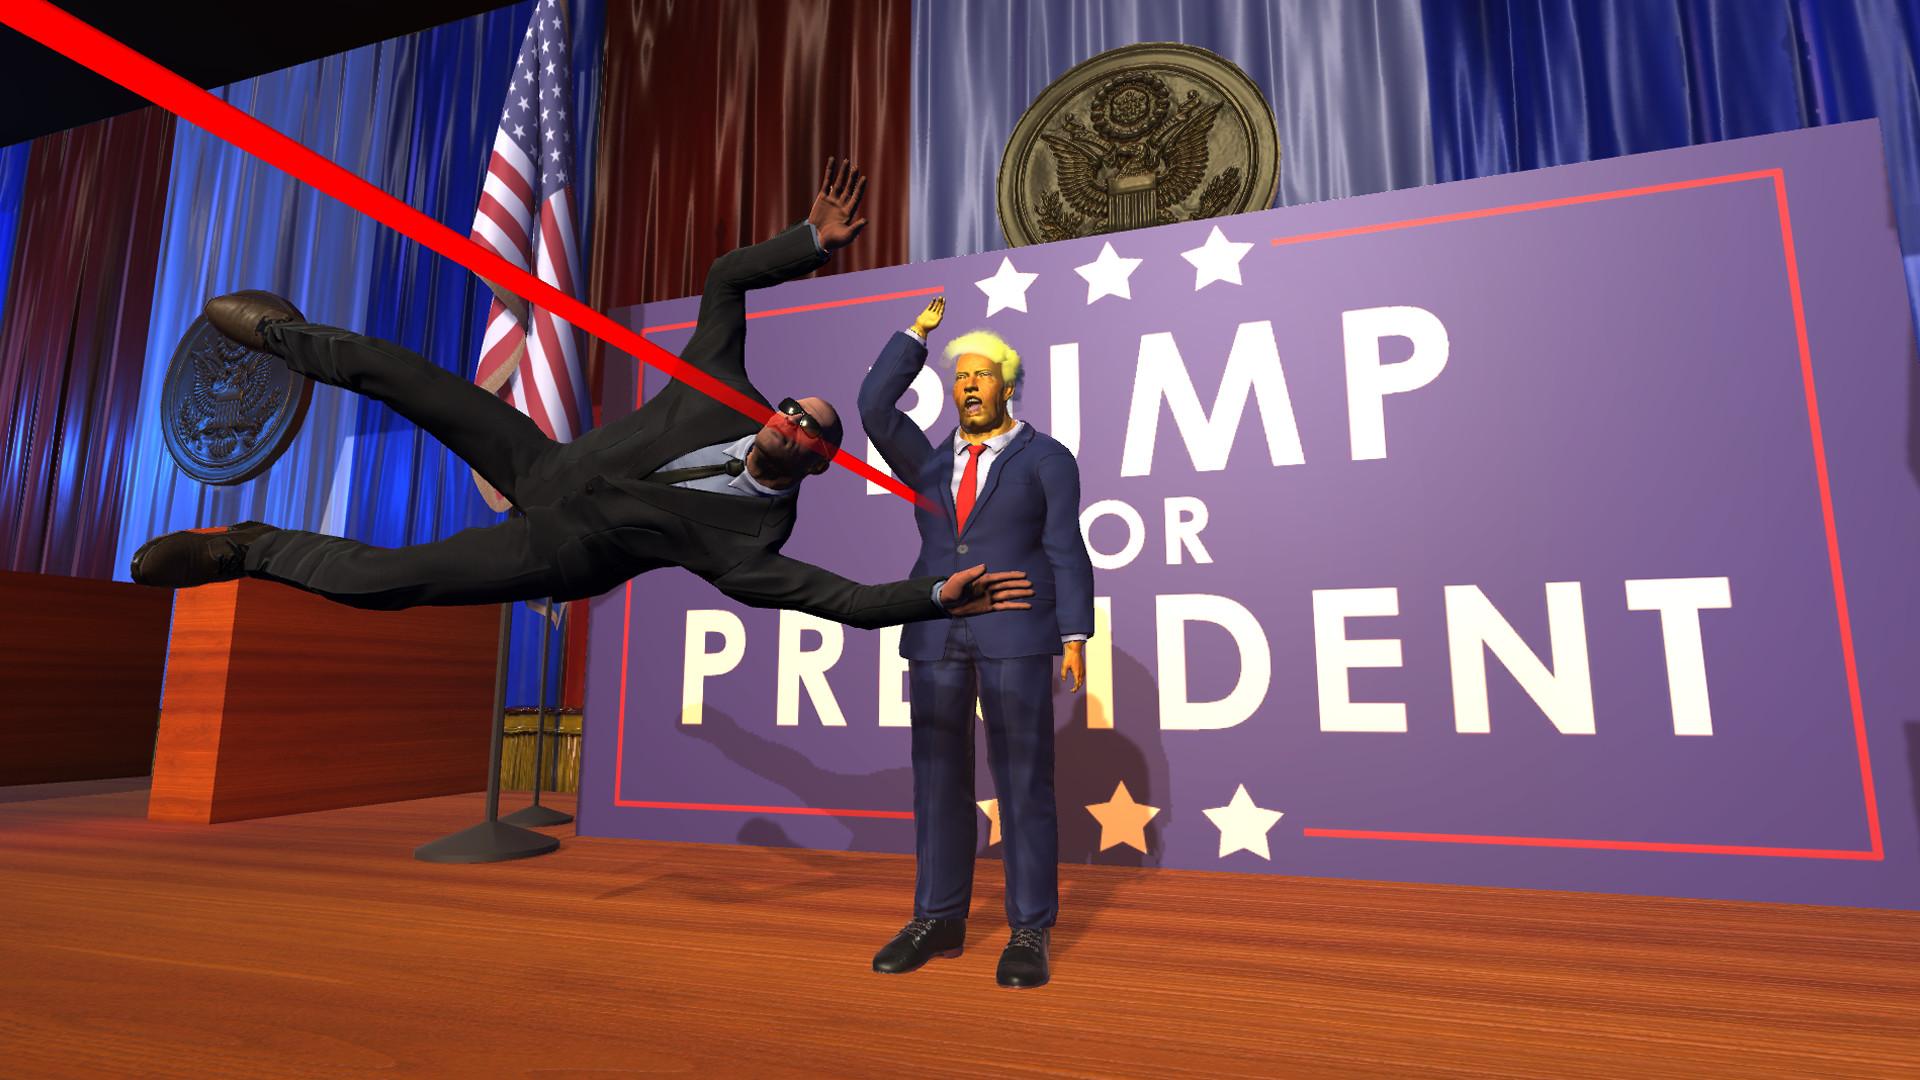 Mr.President! screenshot